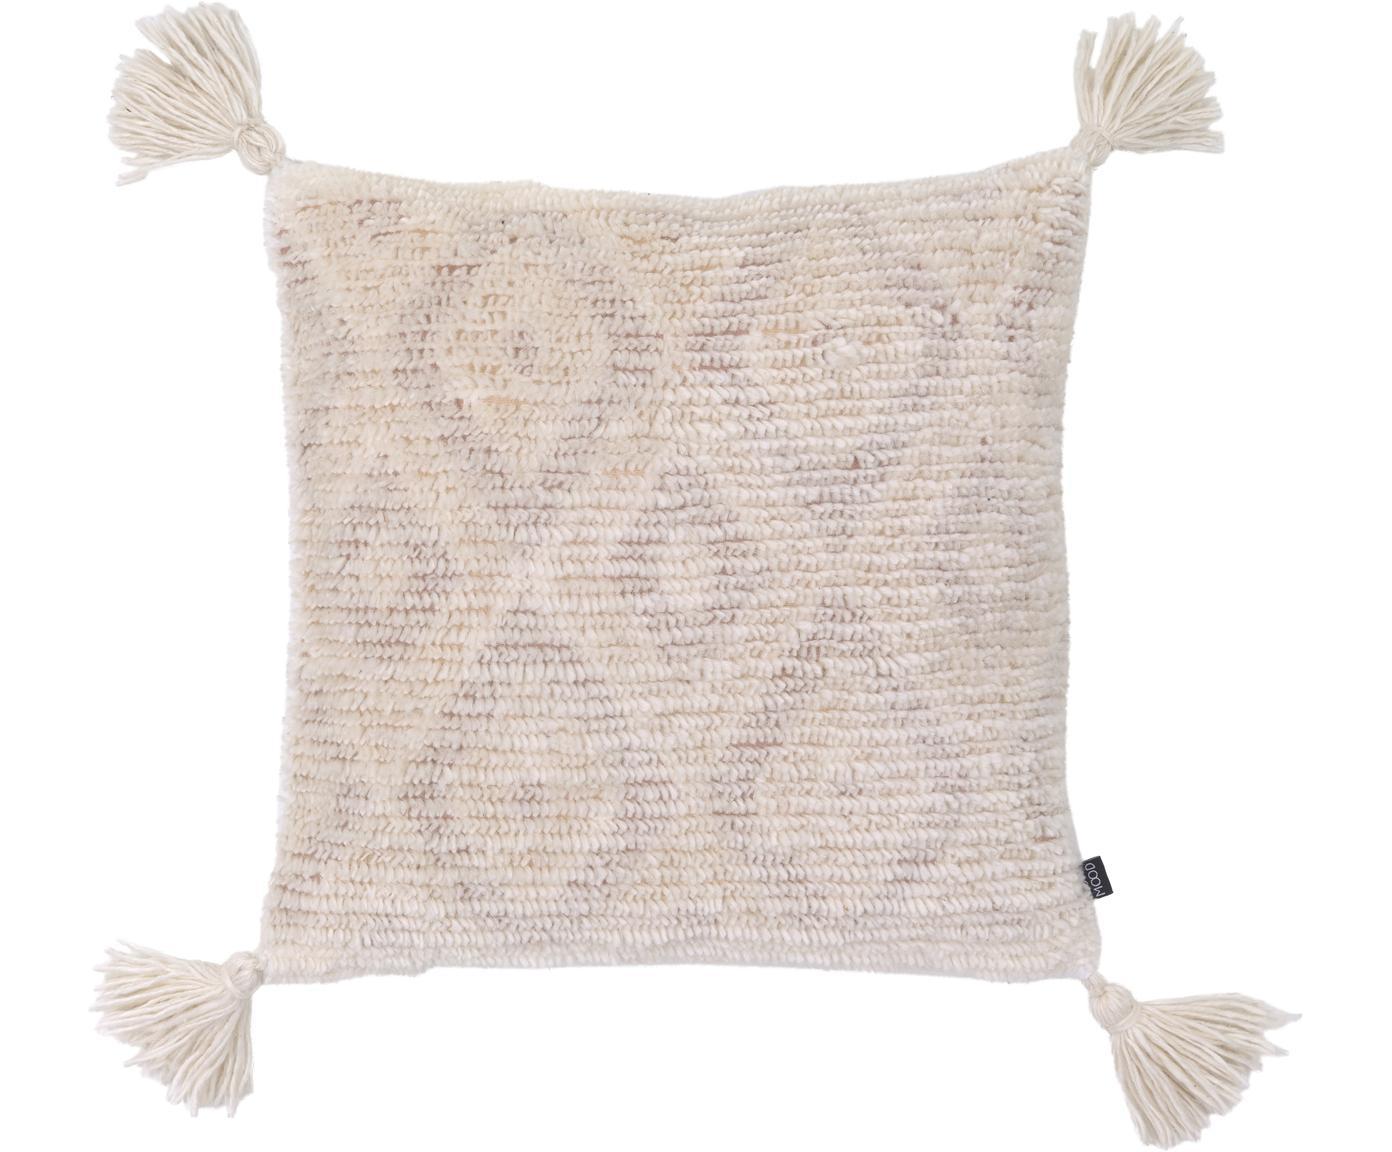 Funda de cojín con borlas Zoya, estilo boho, 70%poliéster, 30%algodón, Blanco crema, beige, An 45 x L 45 cm